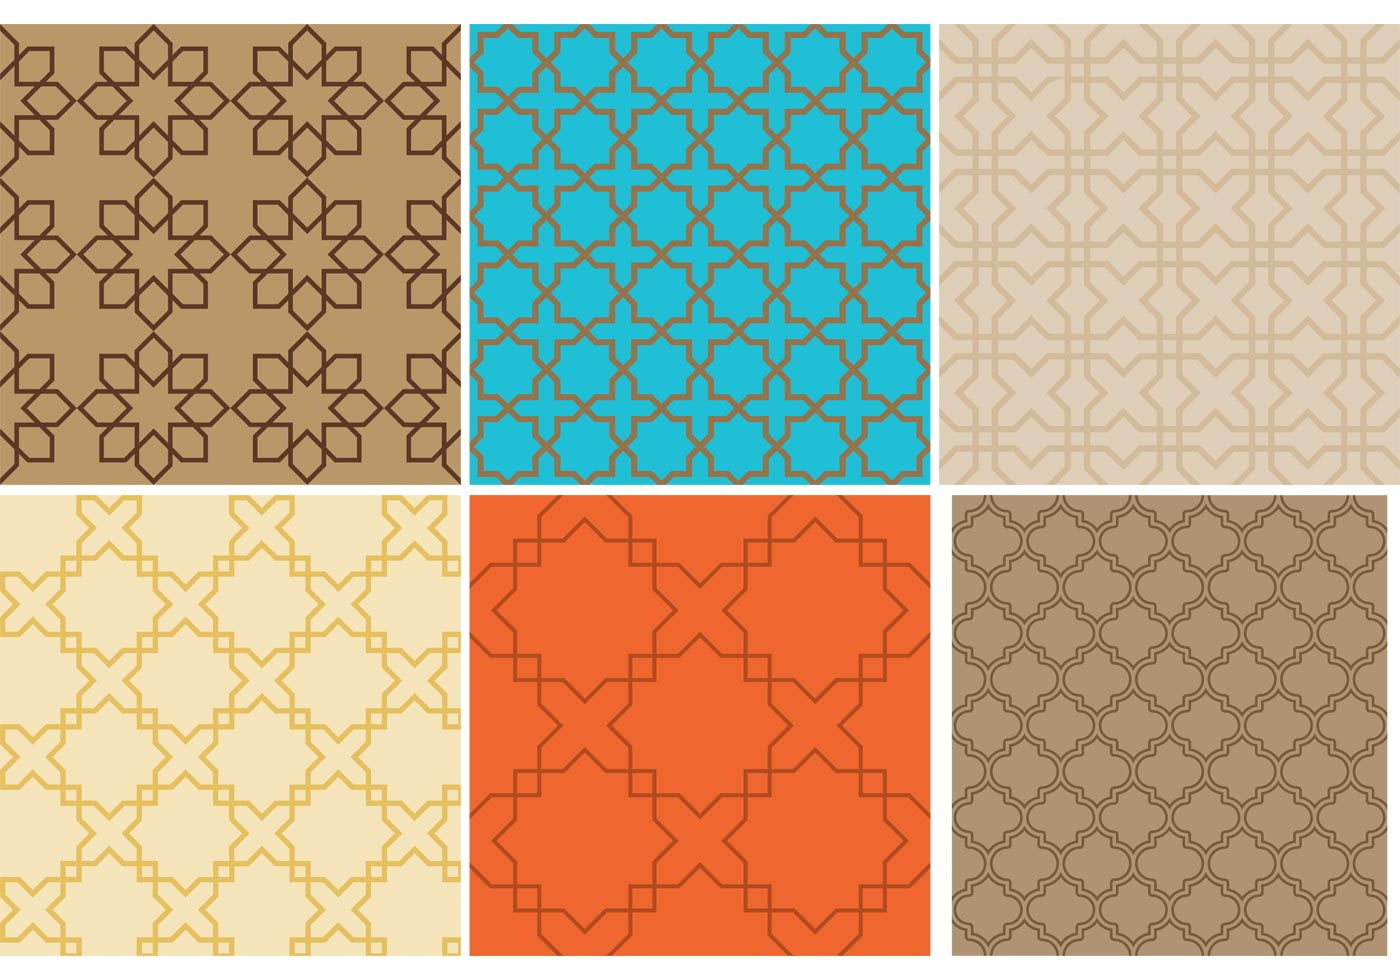 Morocco Pattern Vectors - Download Free Vector Art, Stock Graphics ...